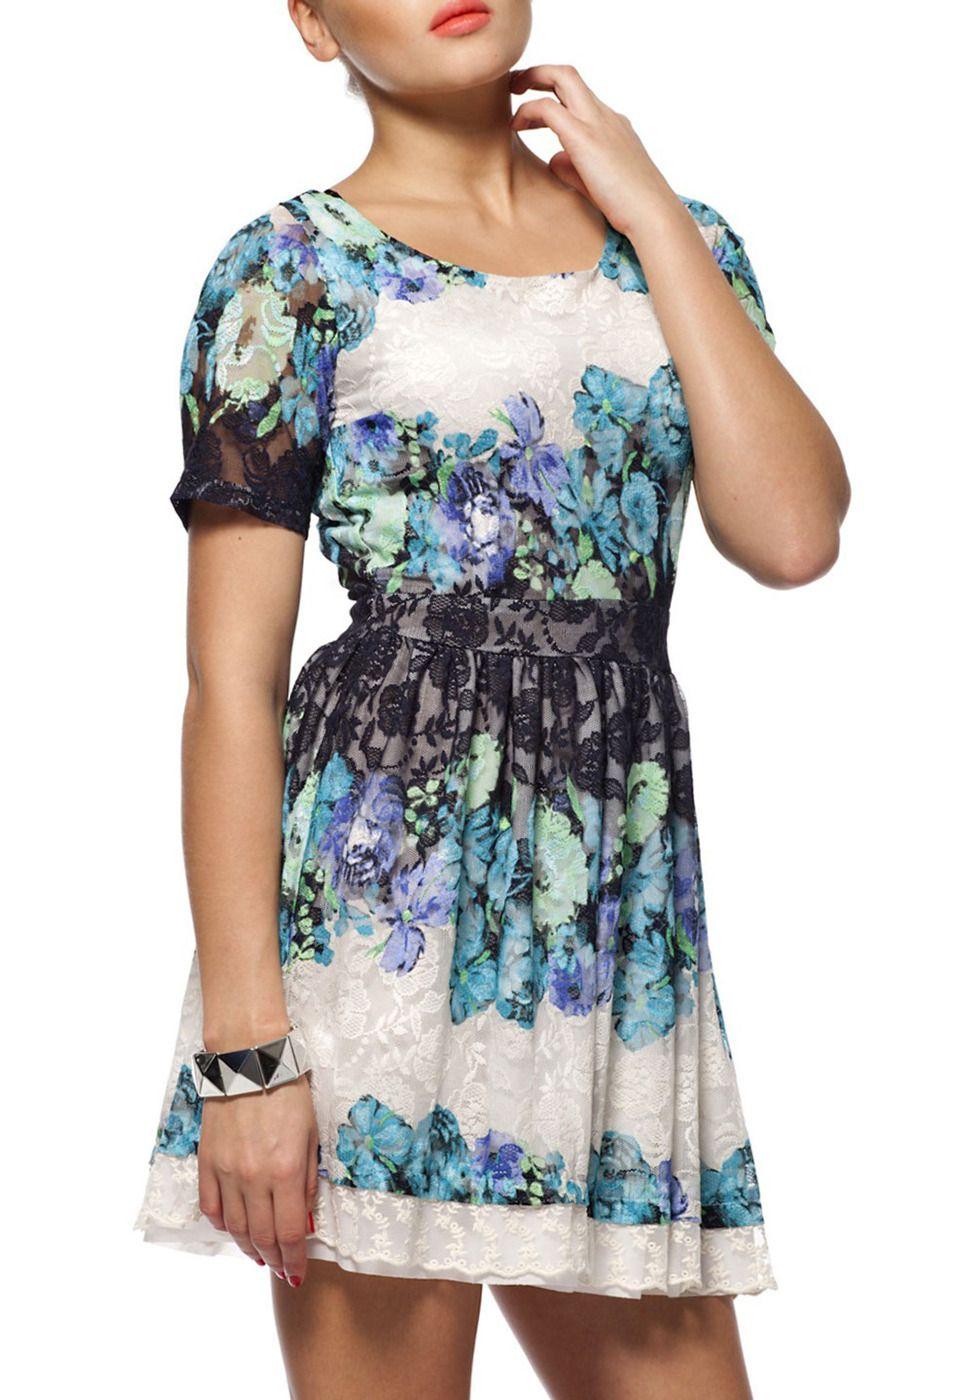 FERVENCY Dahlia Dress in Navy. $29.99